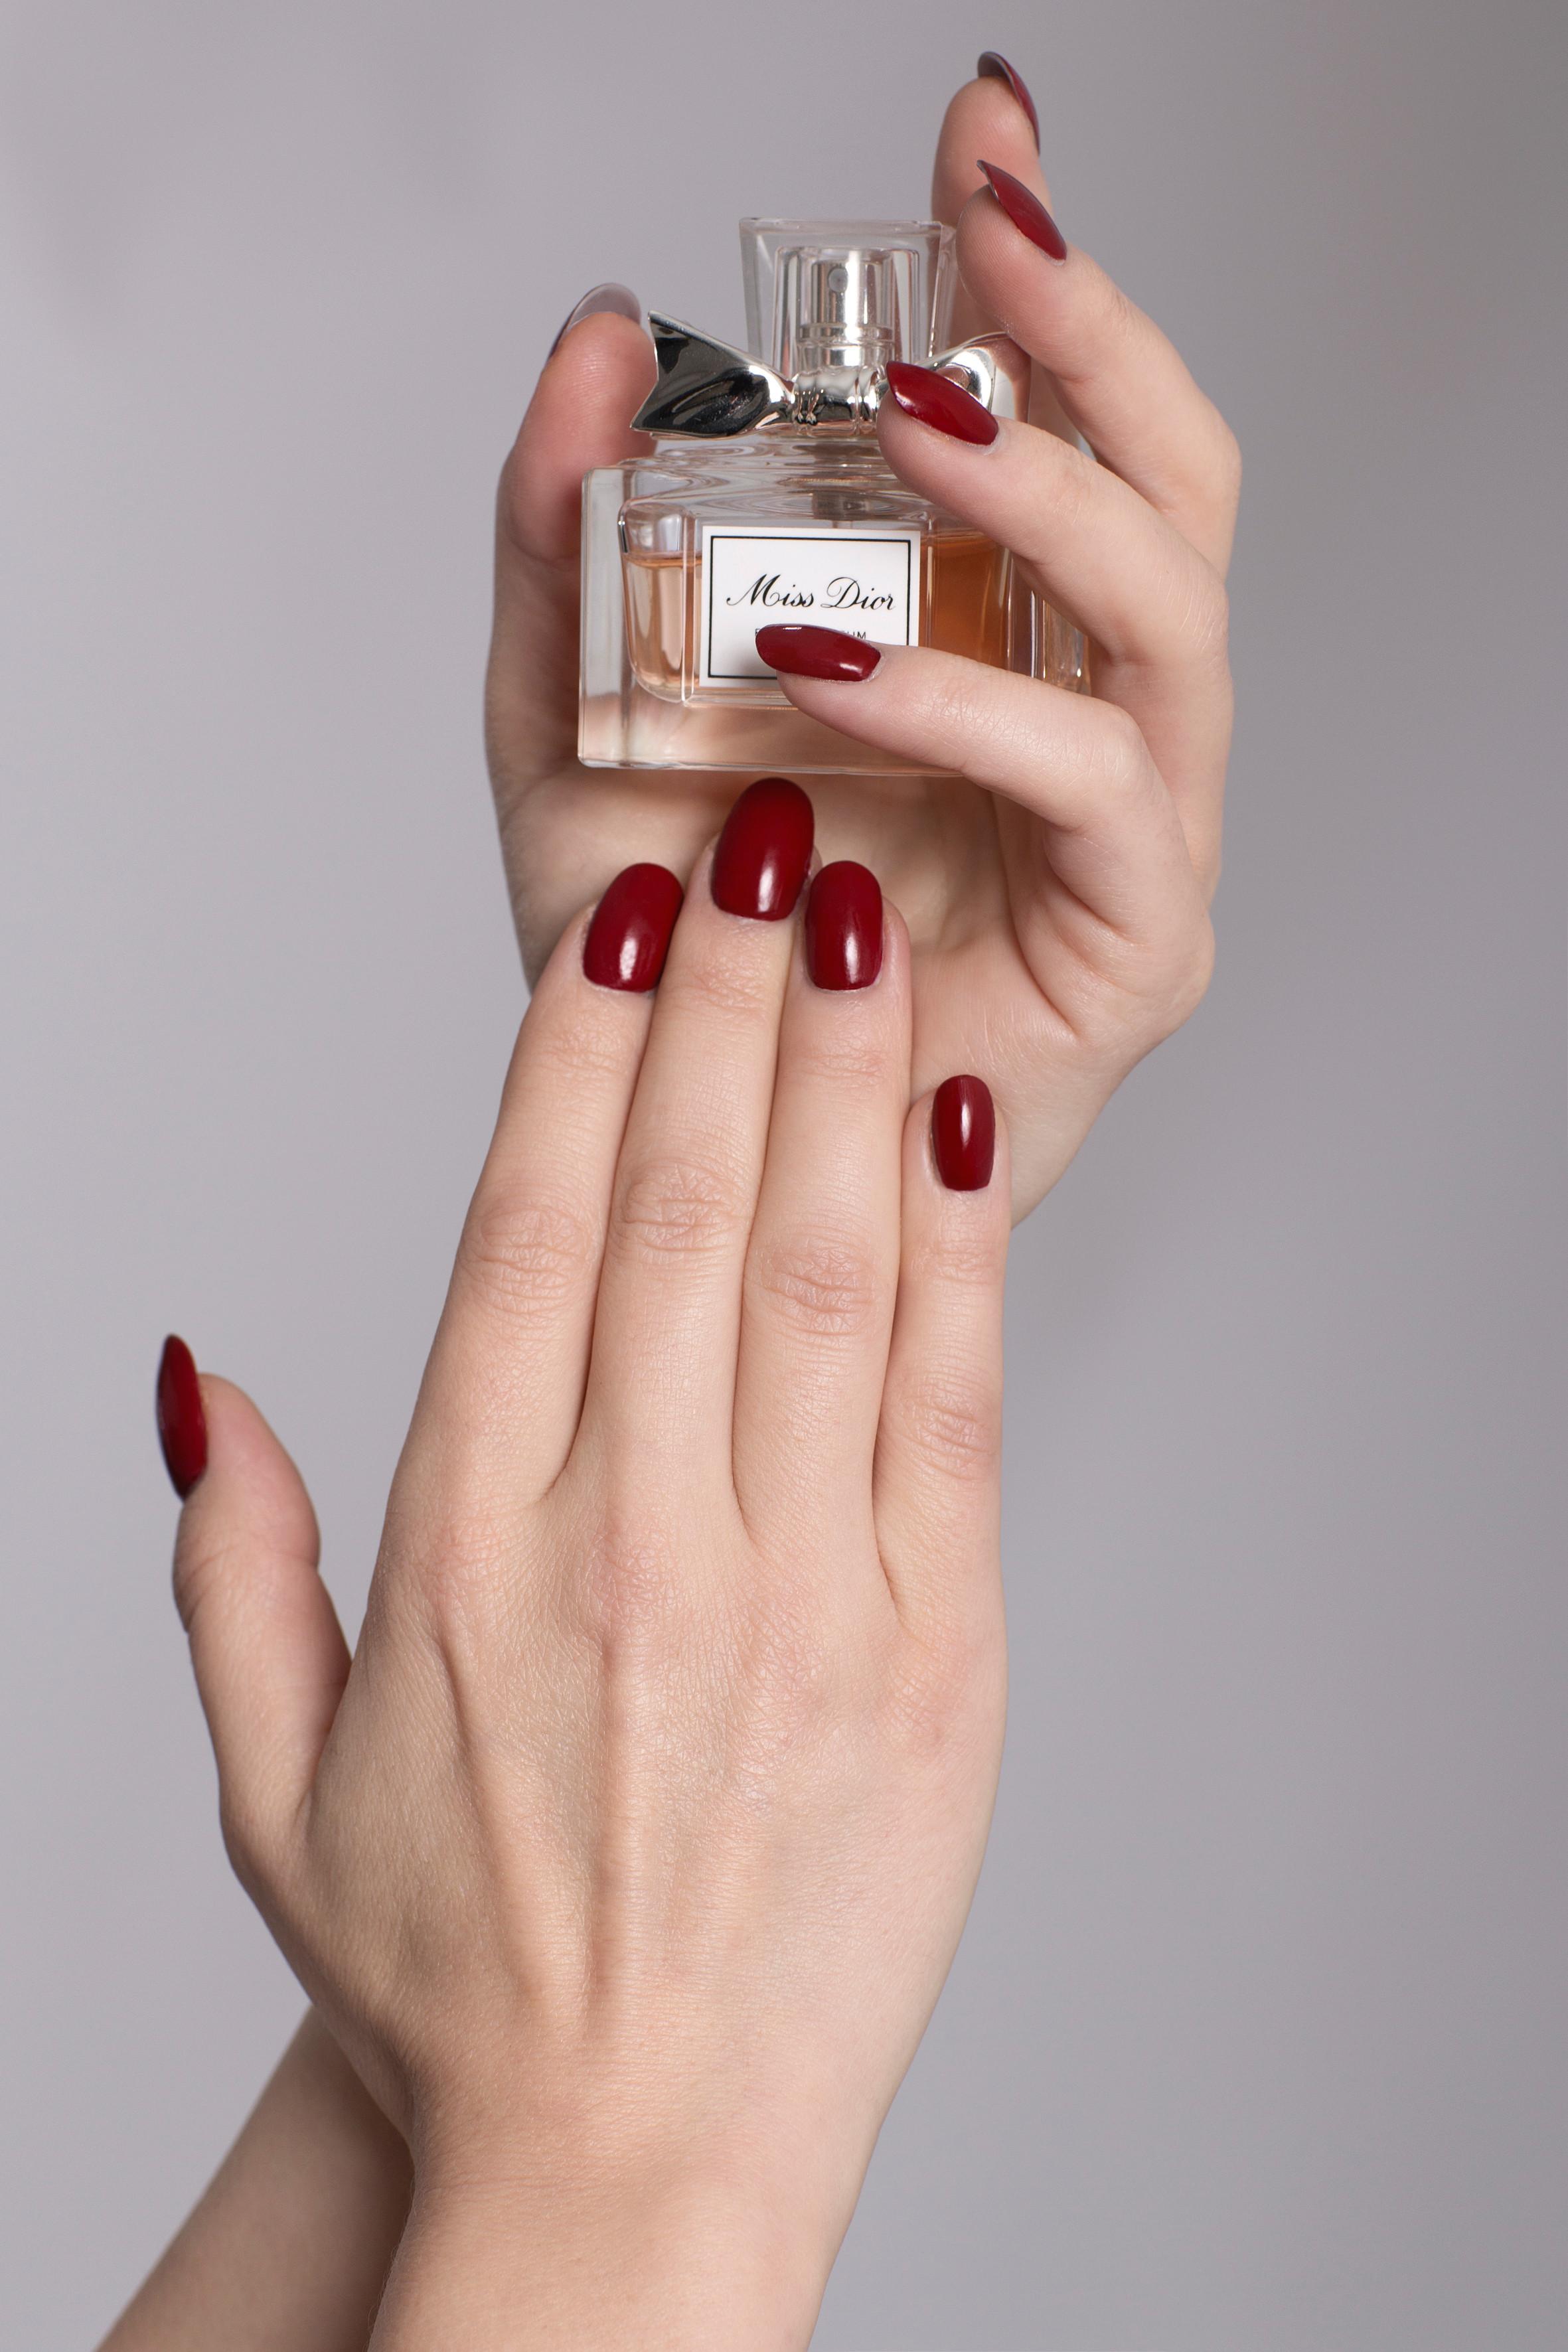 Visagistin Hand Make up, Nägel in dunklem rot lackiert